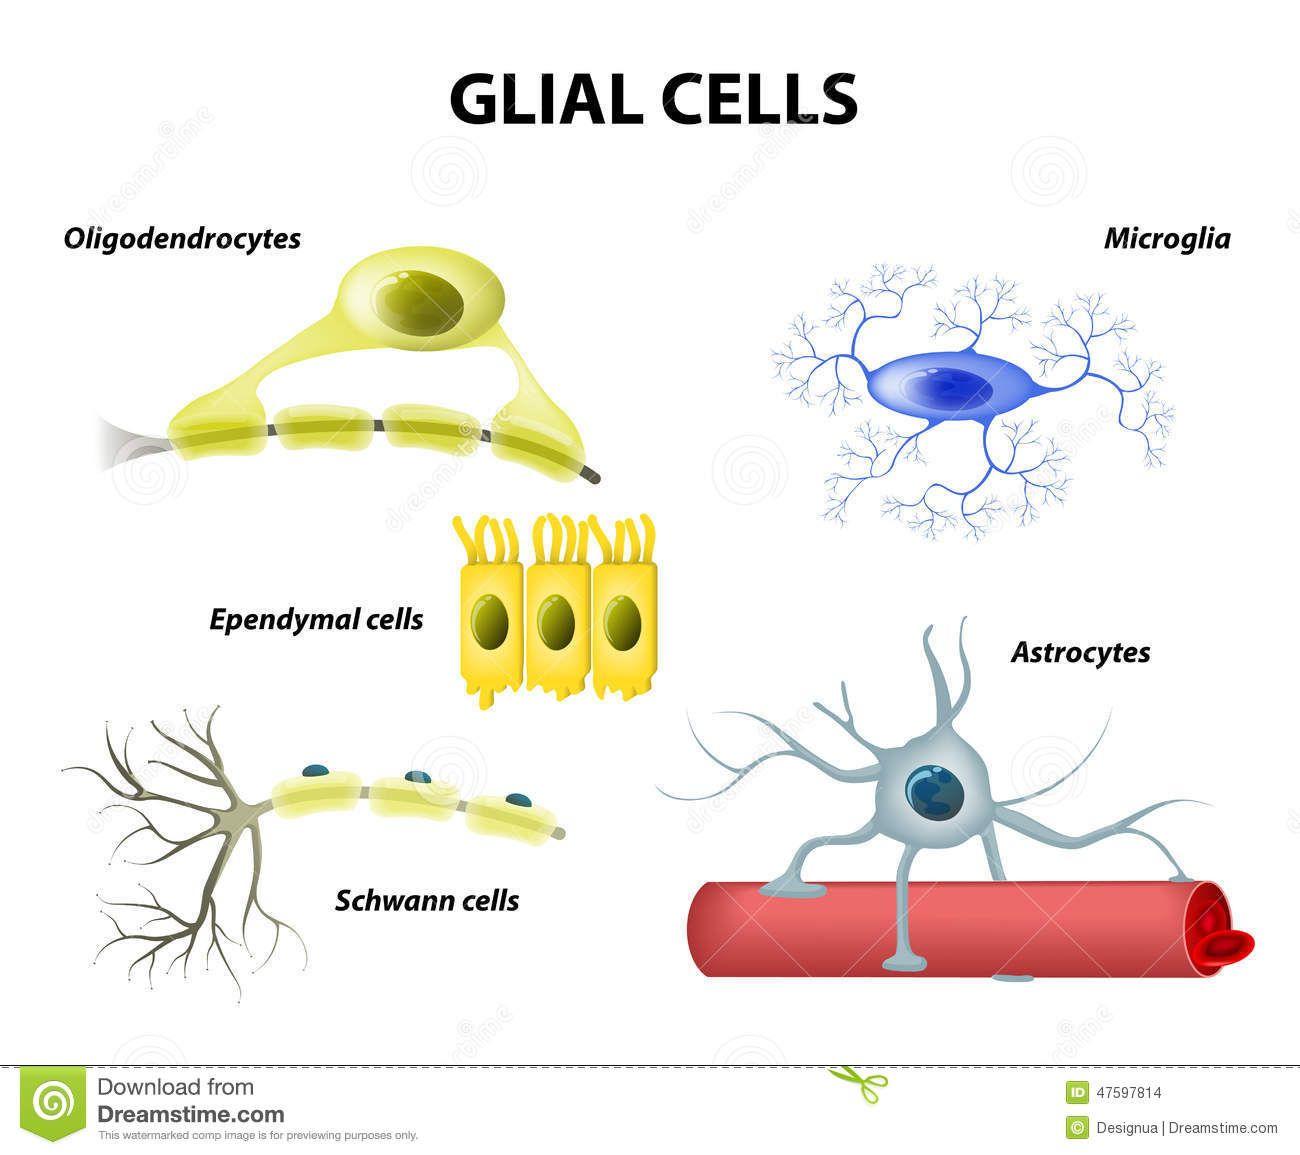 microglia and macroglia - Google Search | Physiology ...  microglia and m...